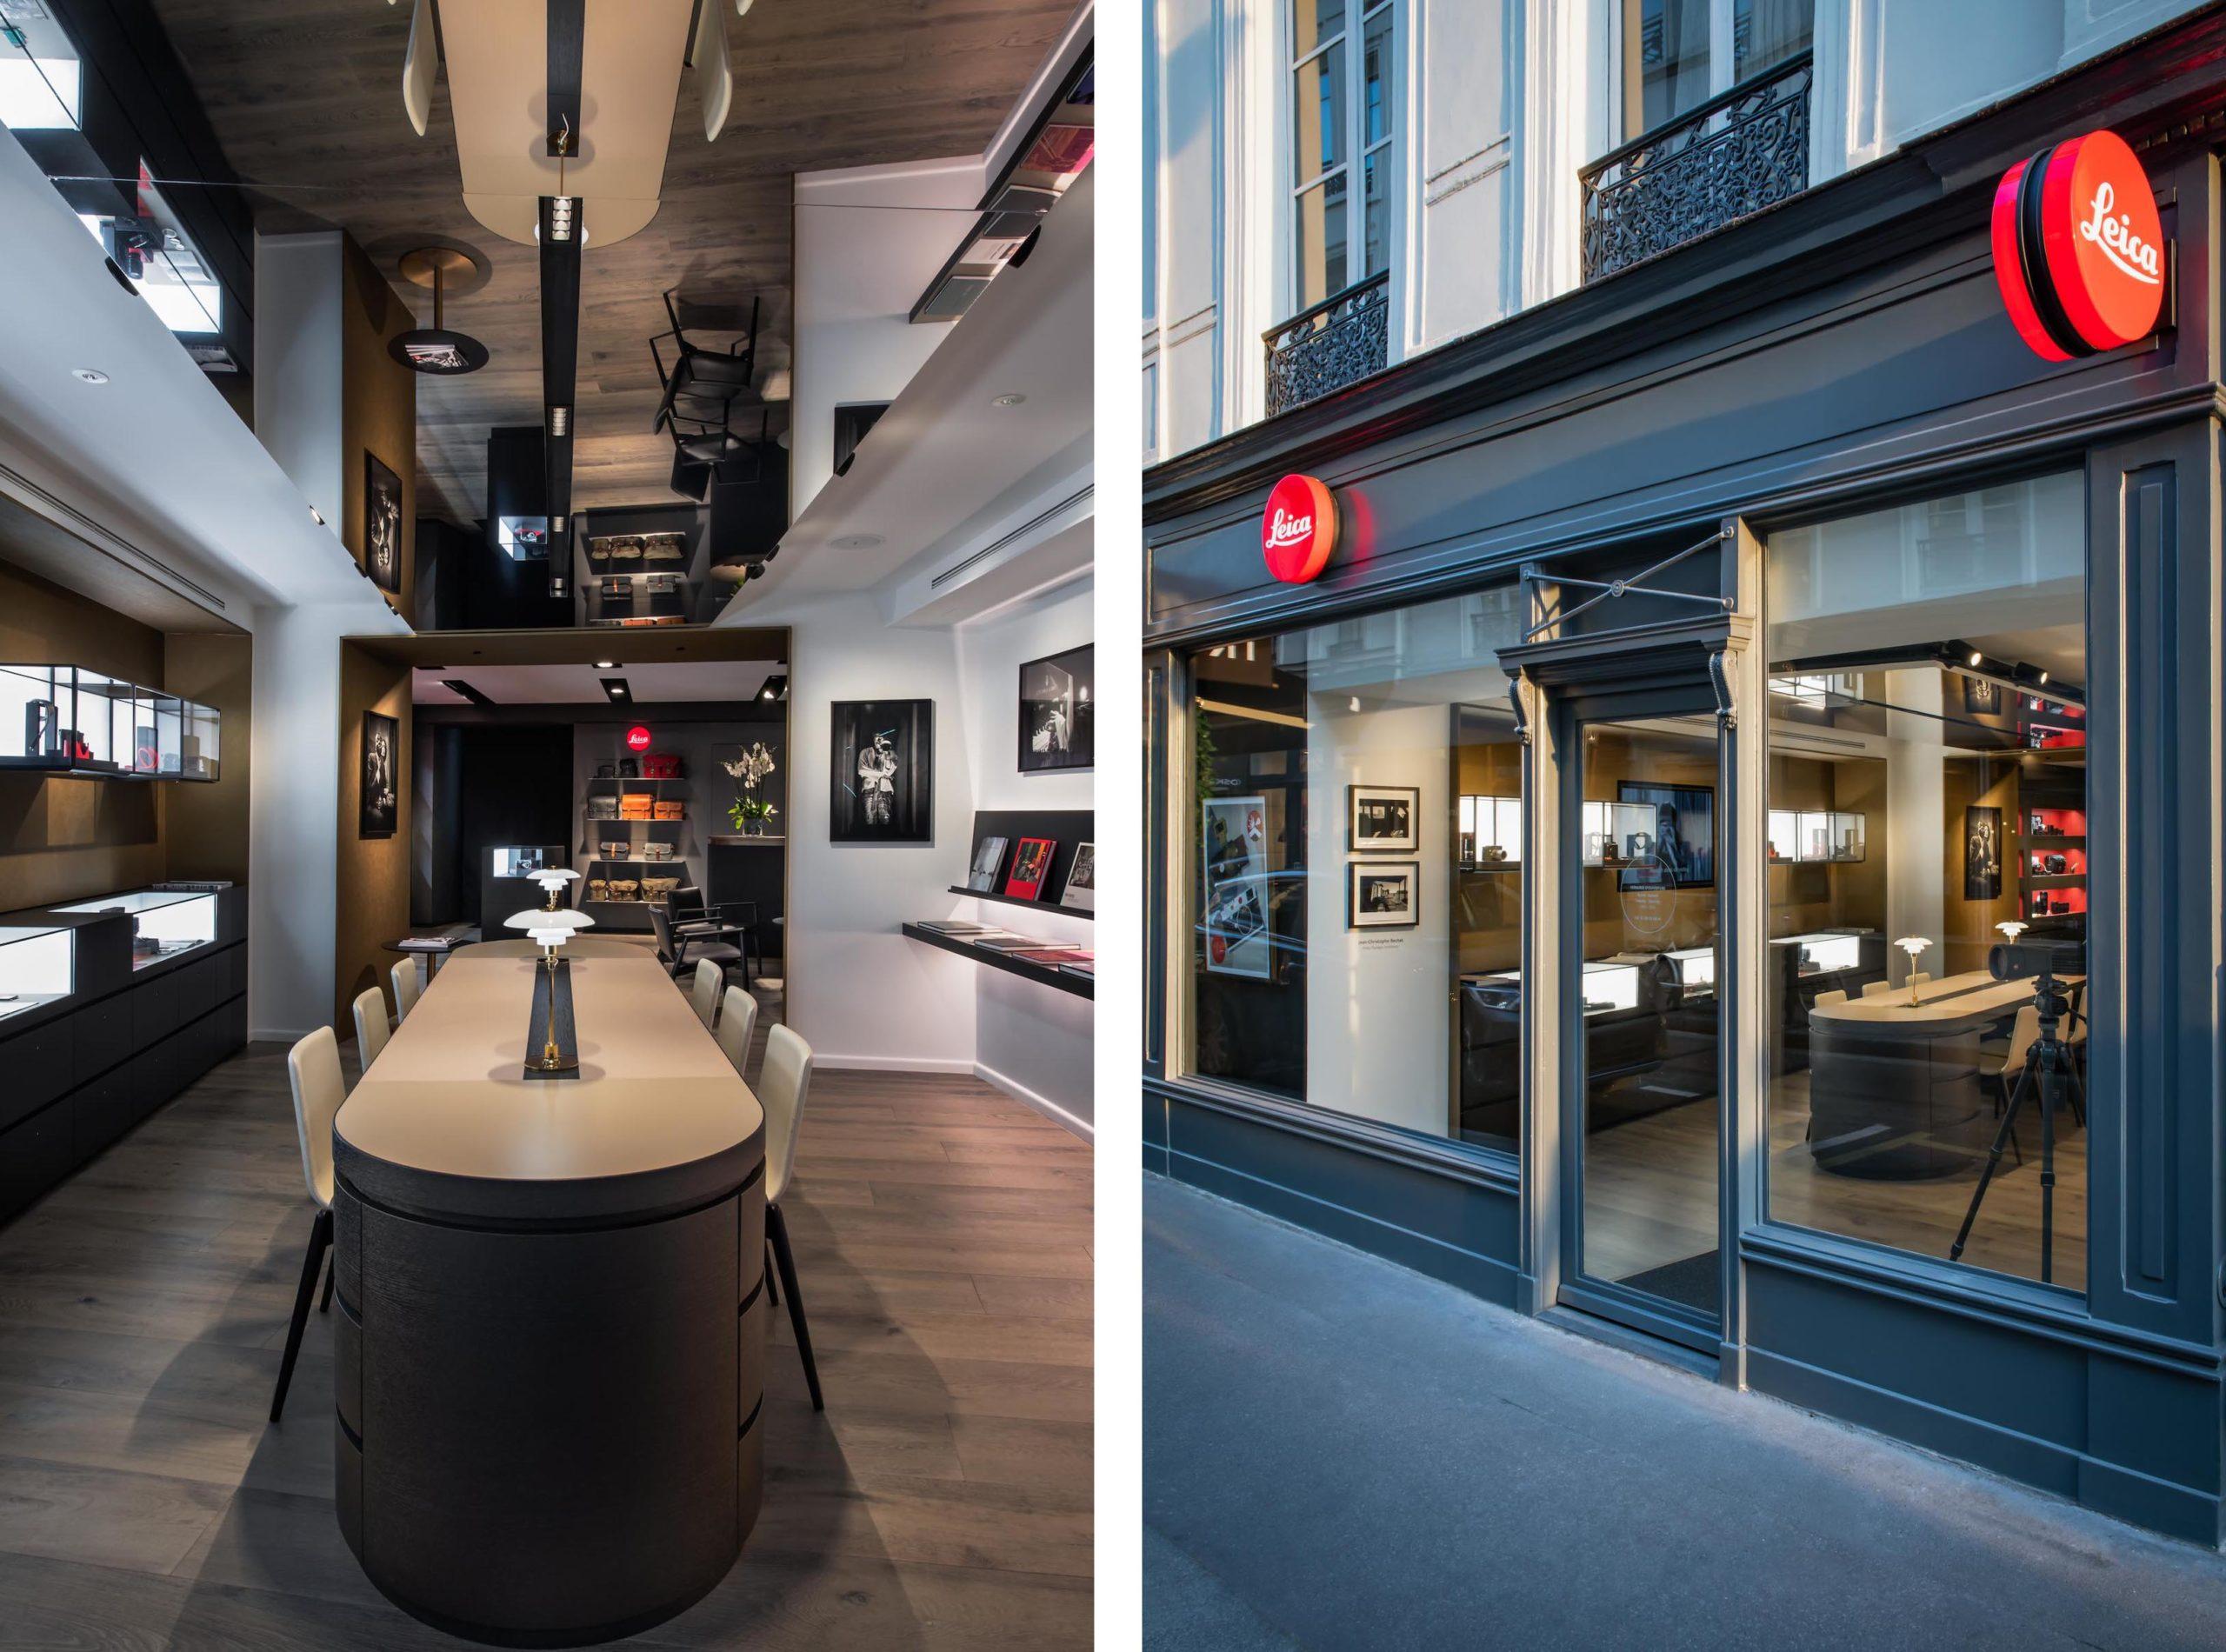 Leica-Store-Rive-Gauche-Paris_verticale-2